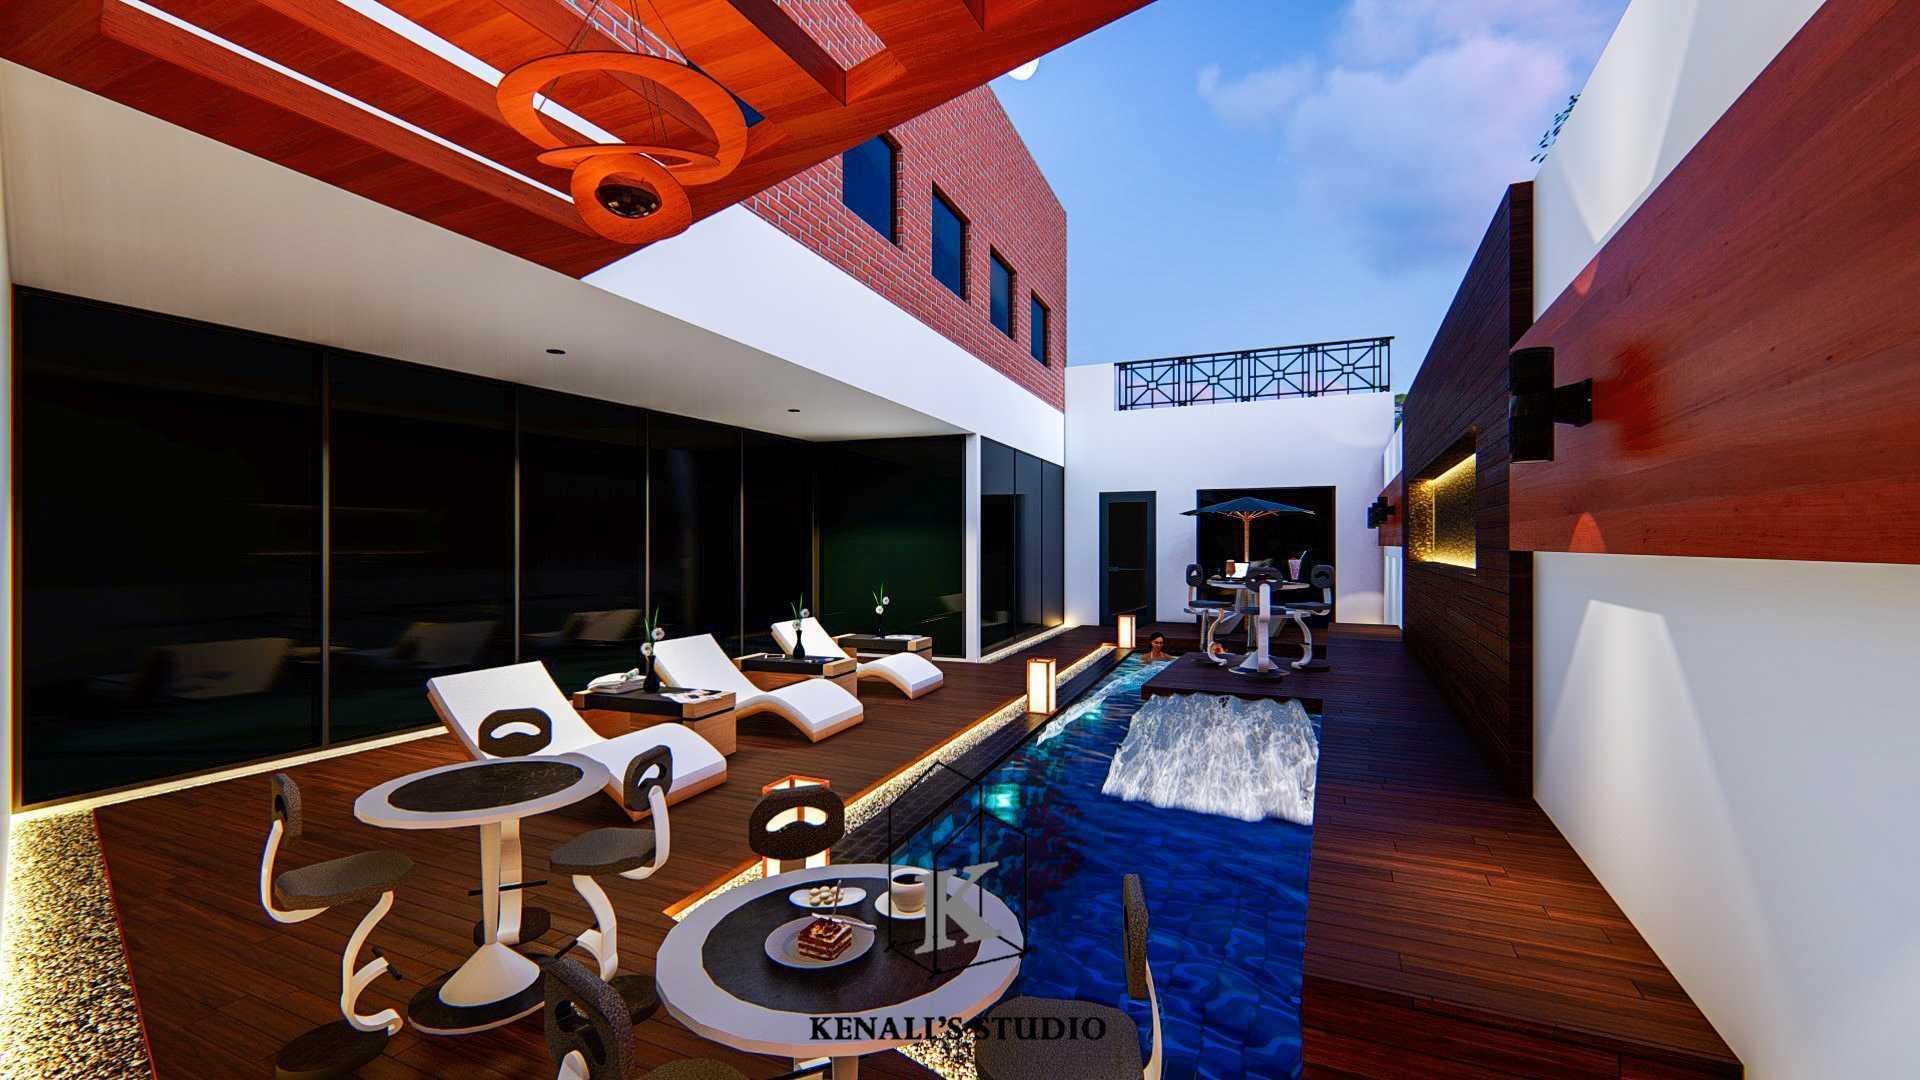 "Kenali's Studio ""hidden Treasure"" Project : Swimming Pool Kuwait Kuwait Kenalis-Studio-Hidden-Treasure-Project-Swimming-Pool  72937"